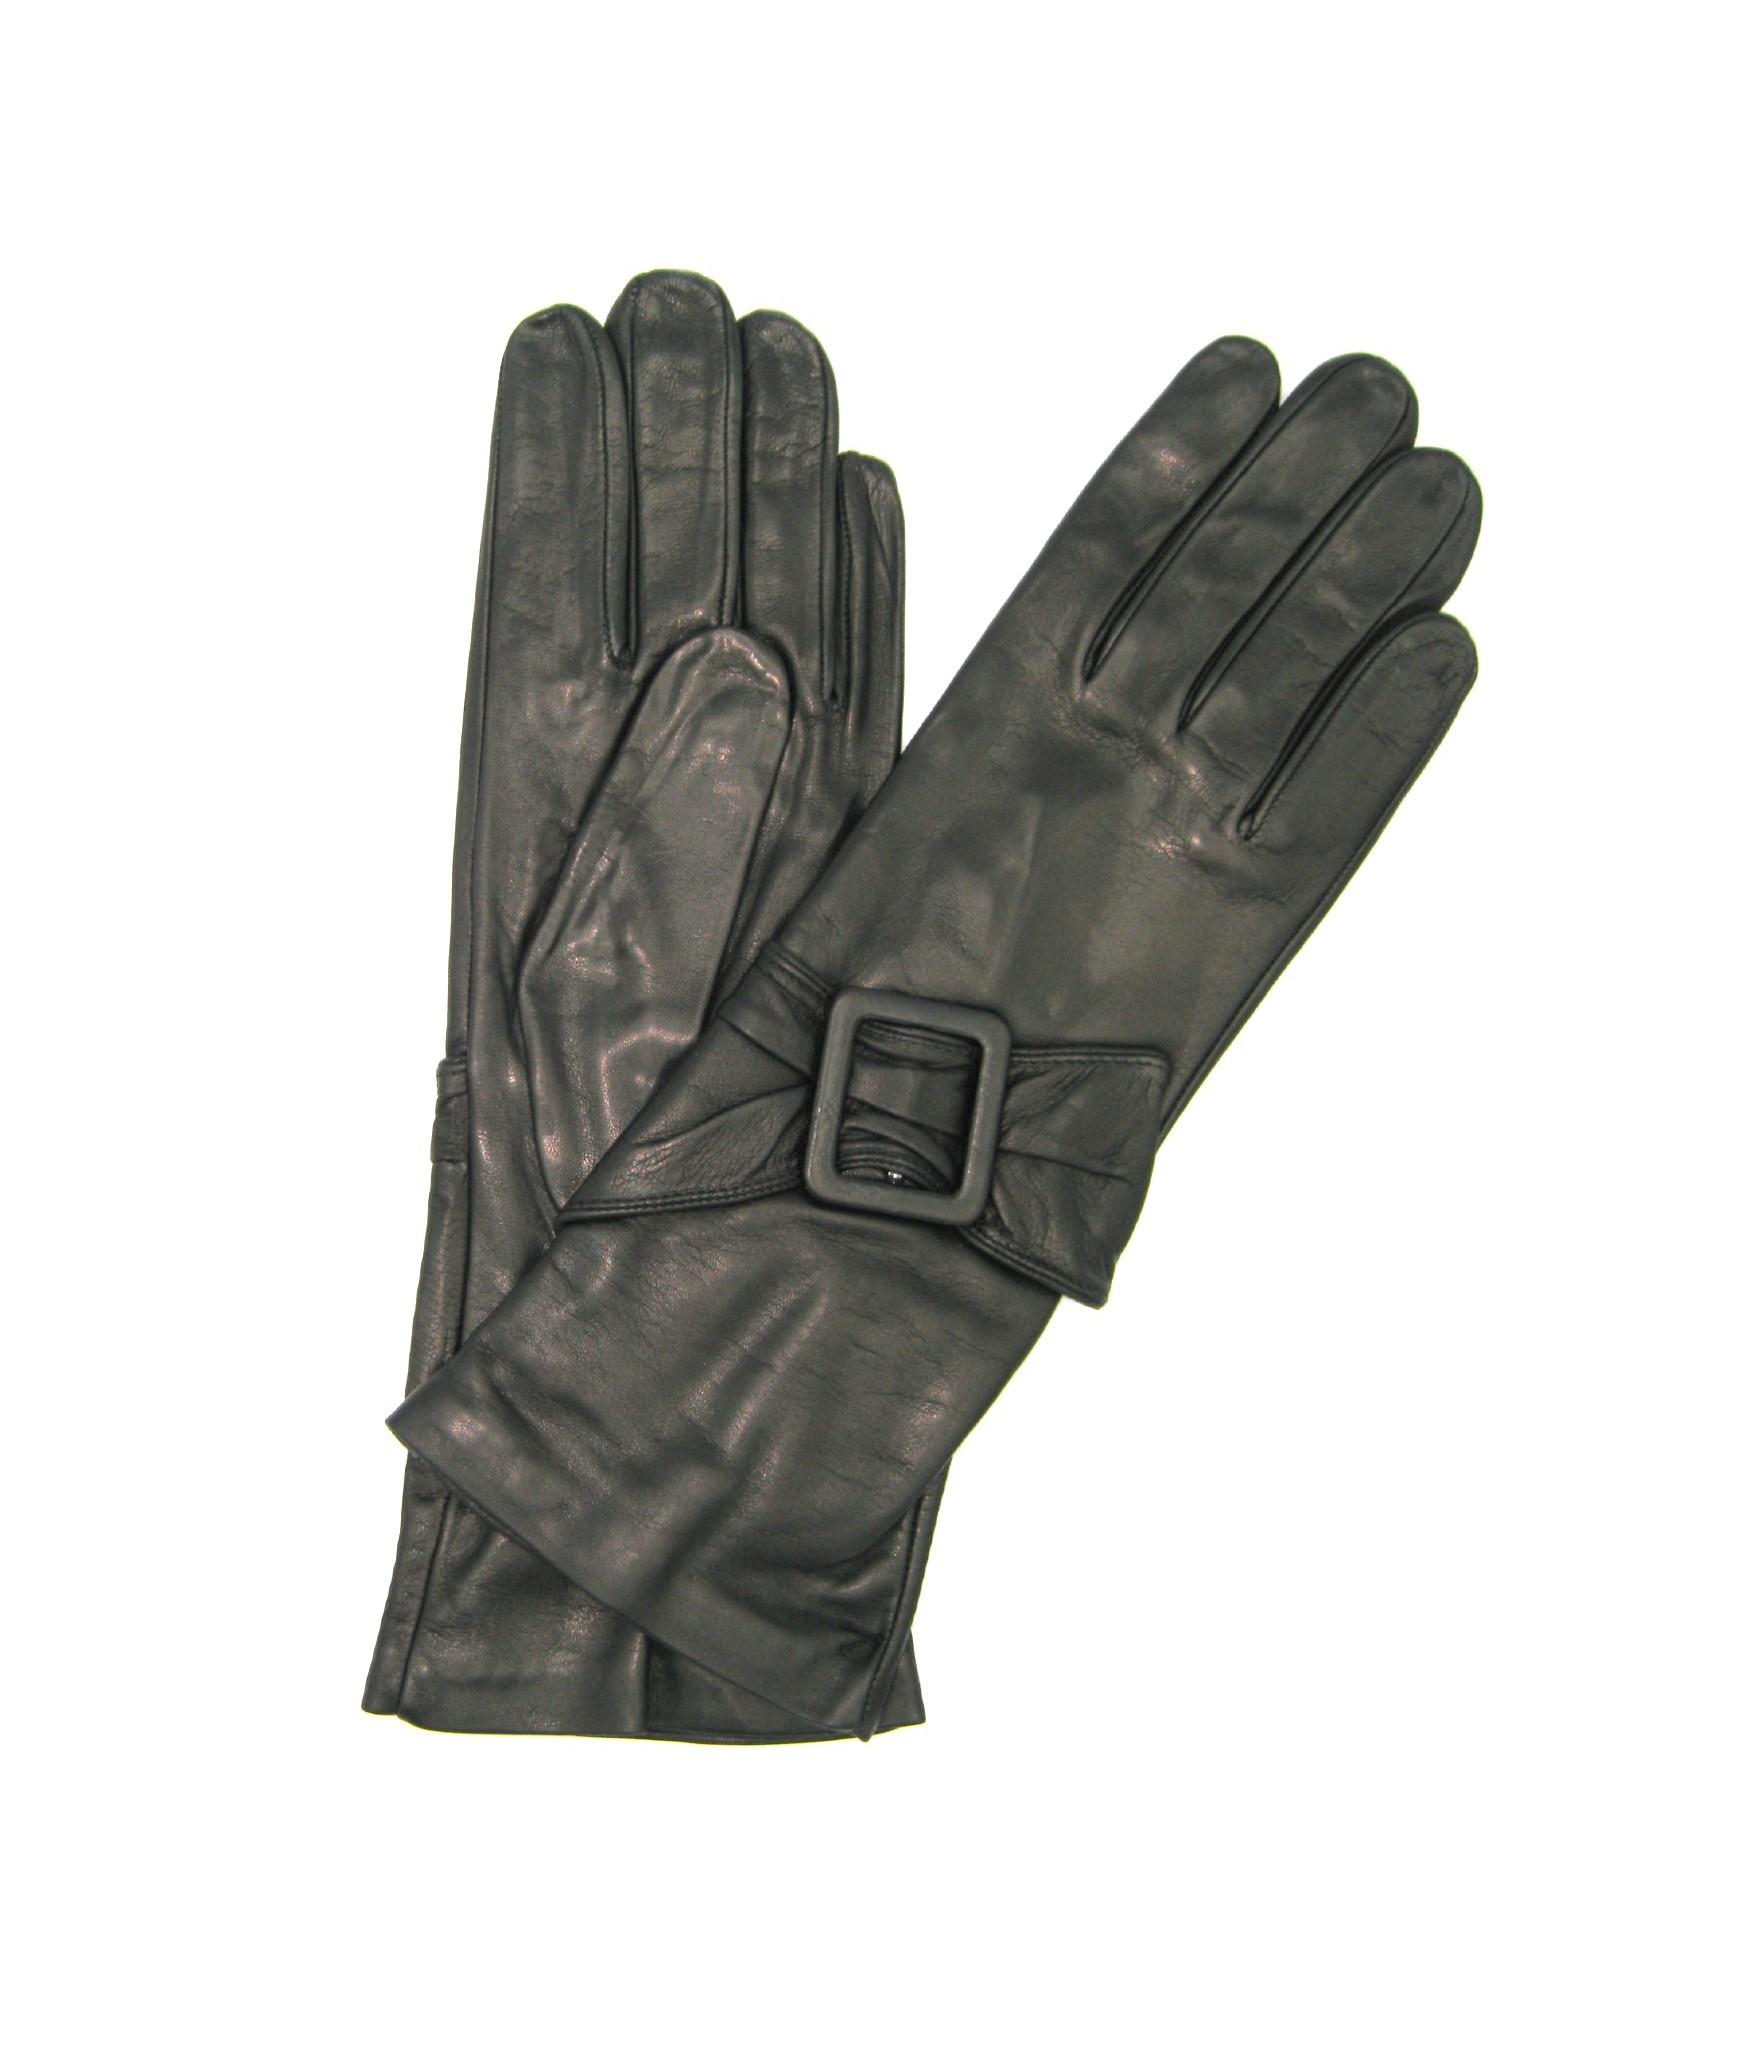 Guanto Nappa 4BT fodera seta con Fibbia Nero Sermoneta Gloves